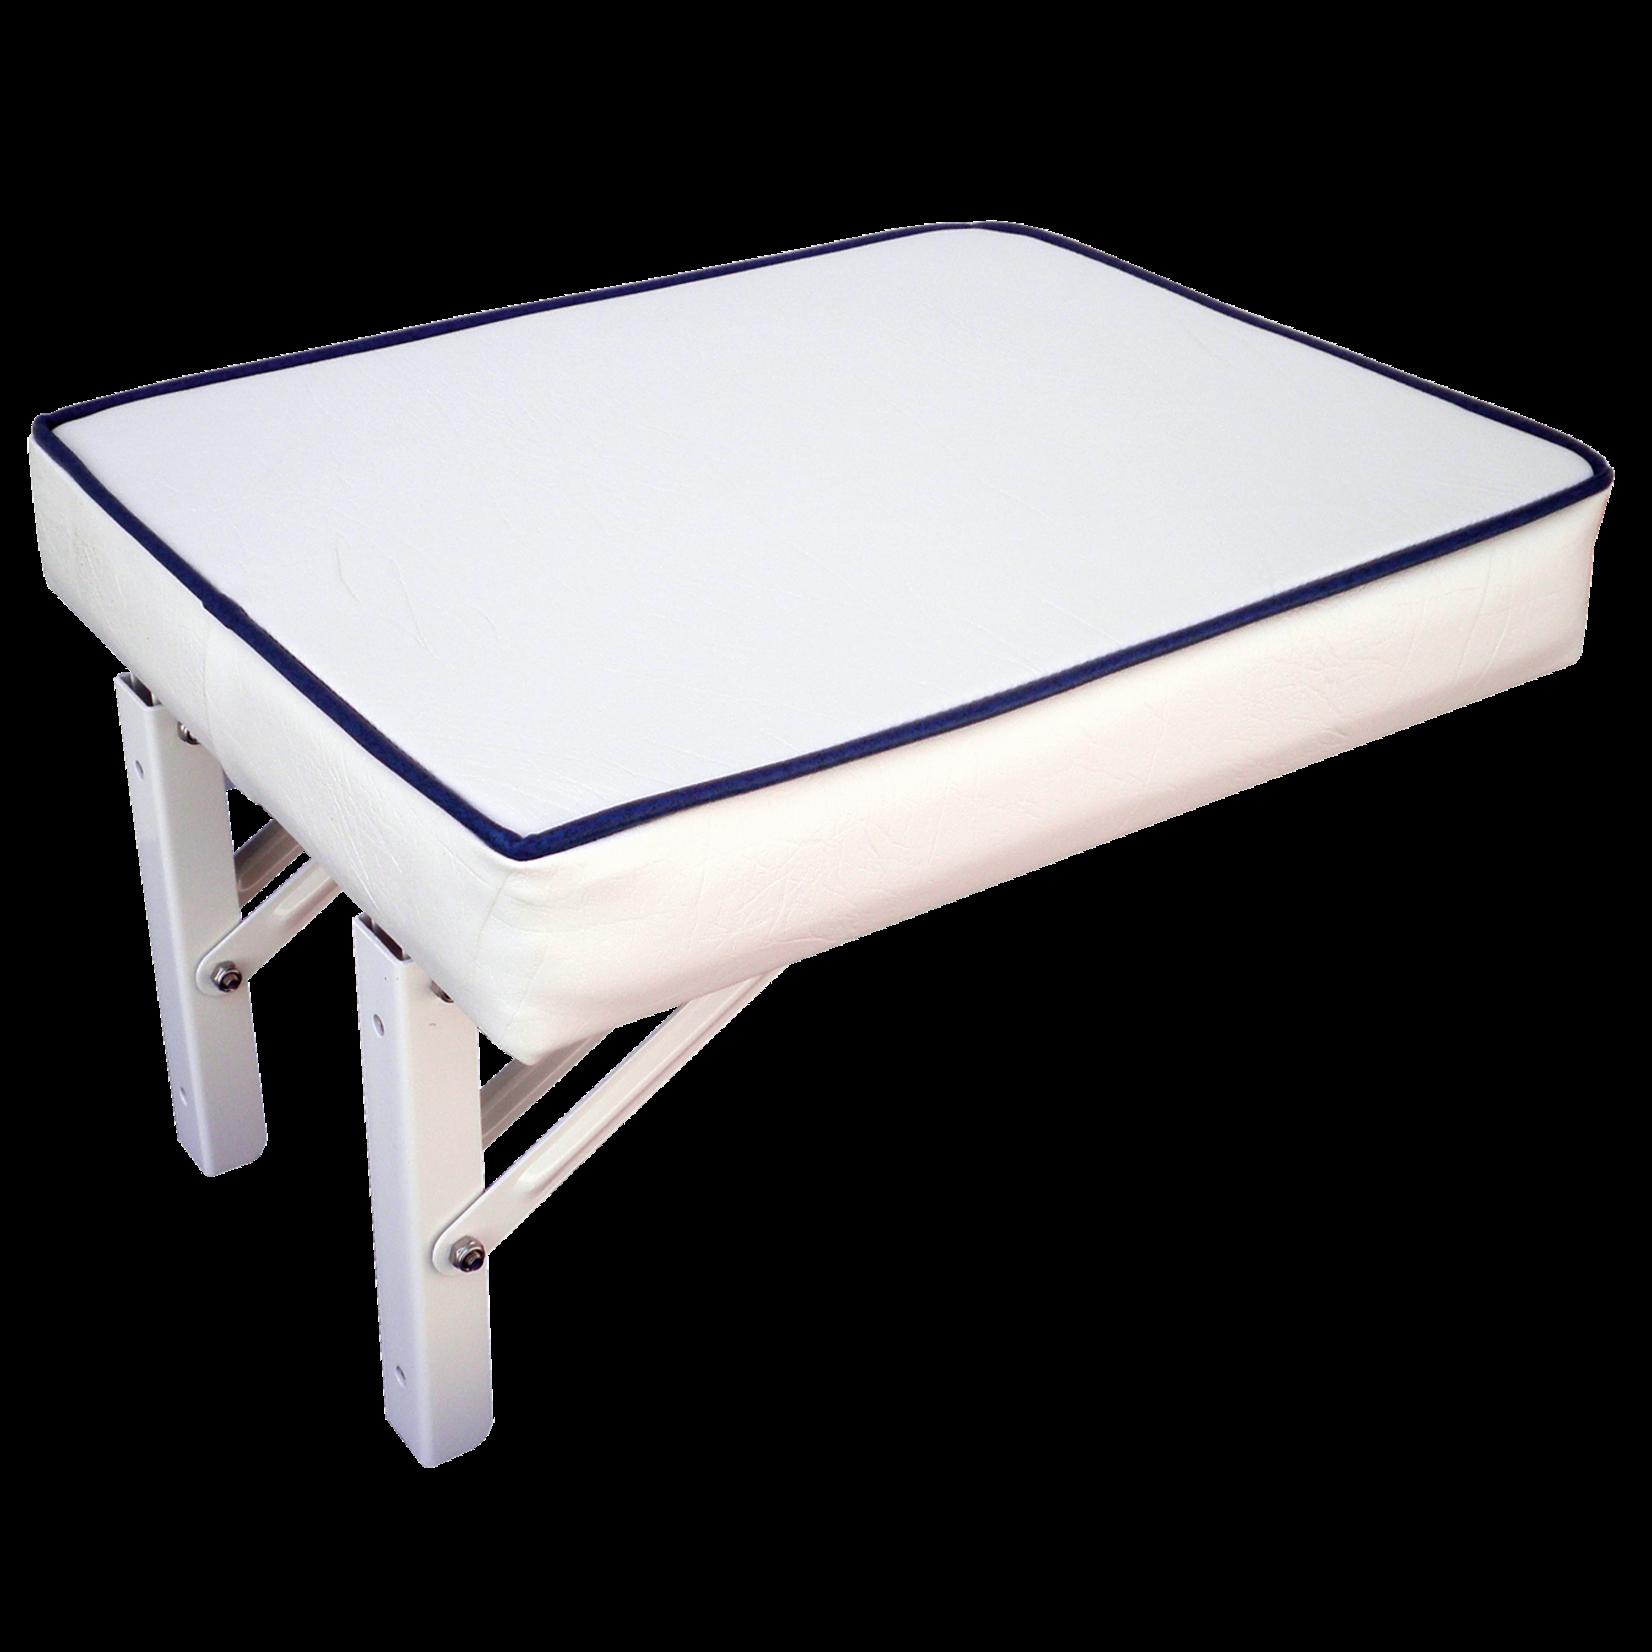 Allpa Kos Boat Seating  - Foldable